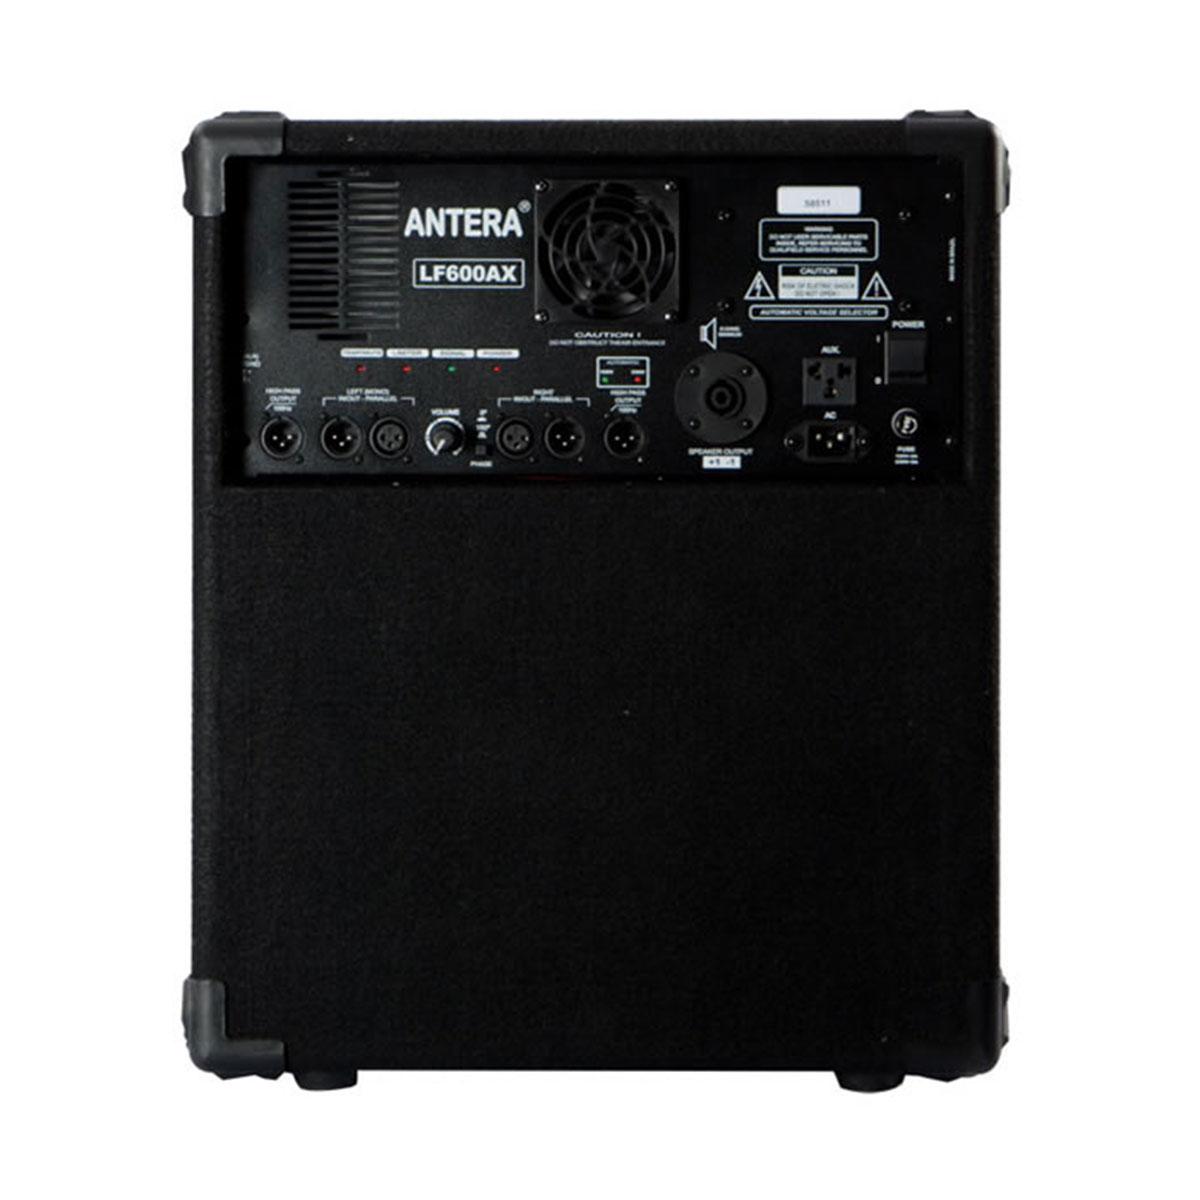 Subwoofer Ativo Fal 12 Pol 300W - LF 600 A X Antera